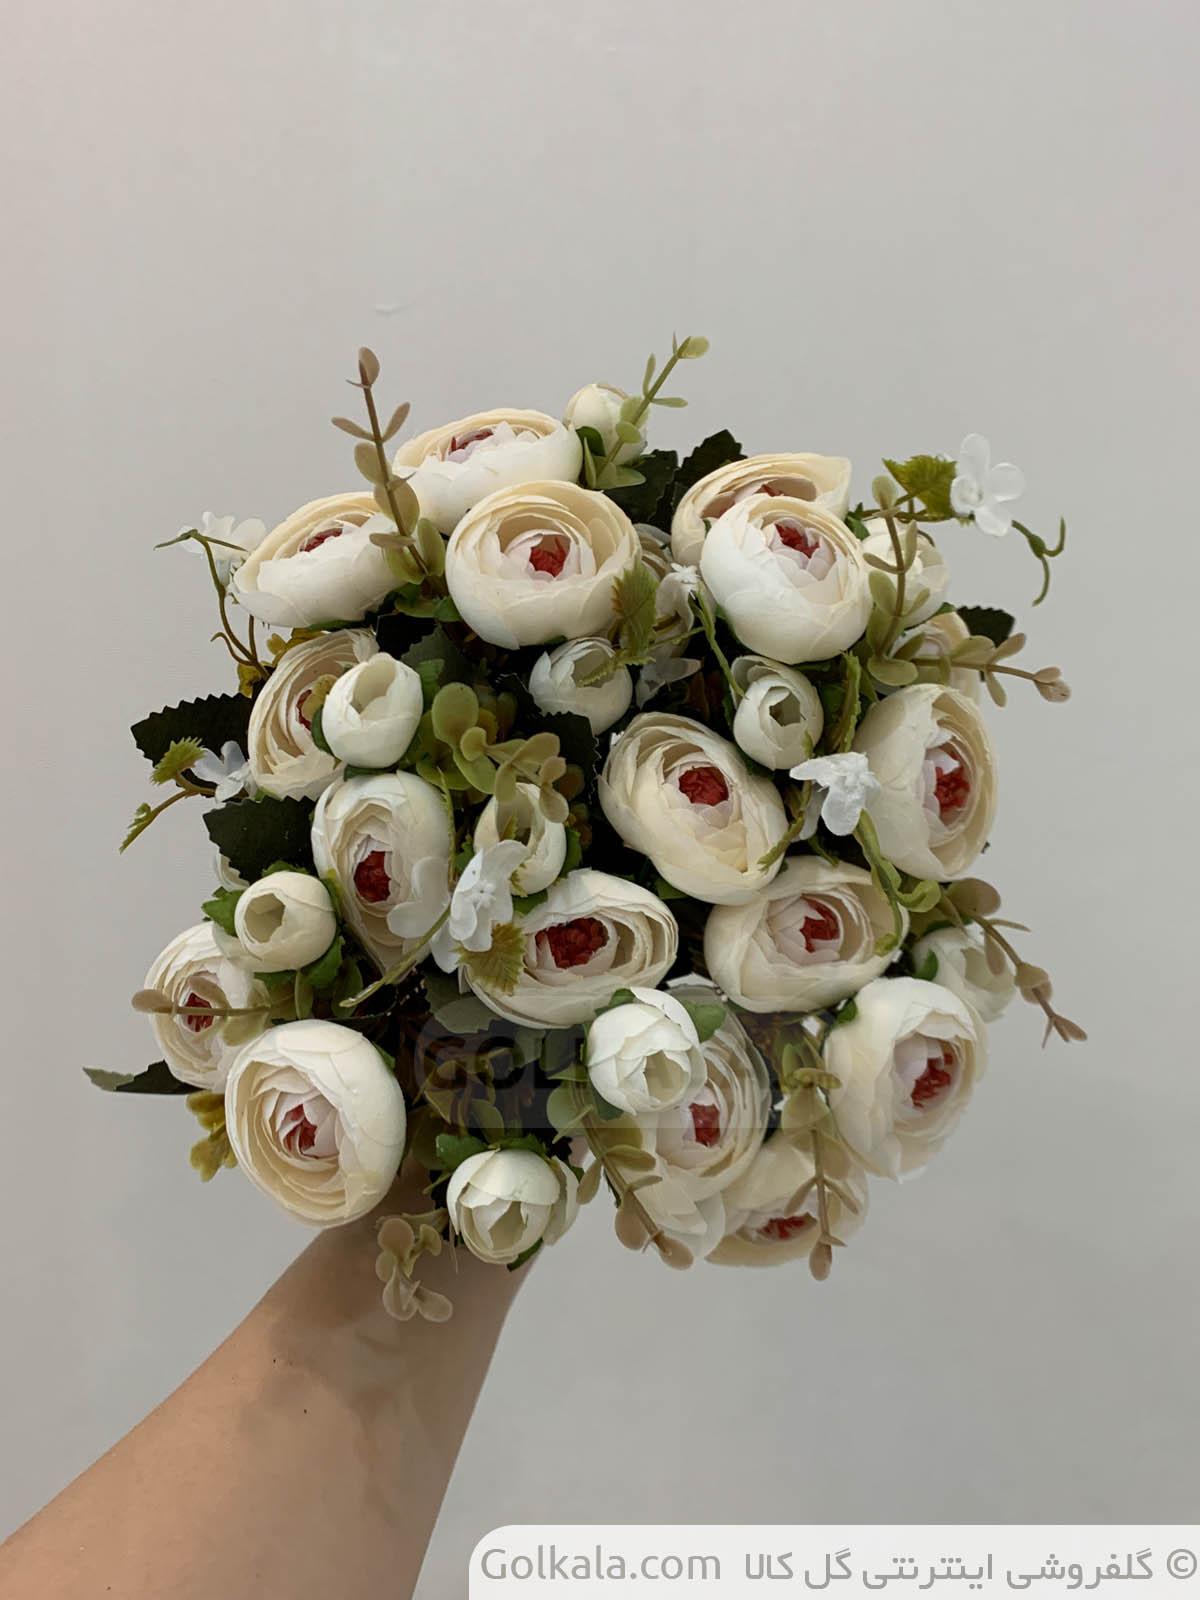 پیونی سفید دسته گل گل کالا